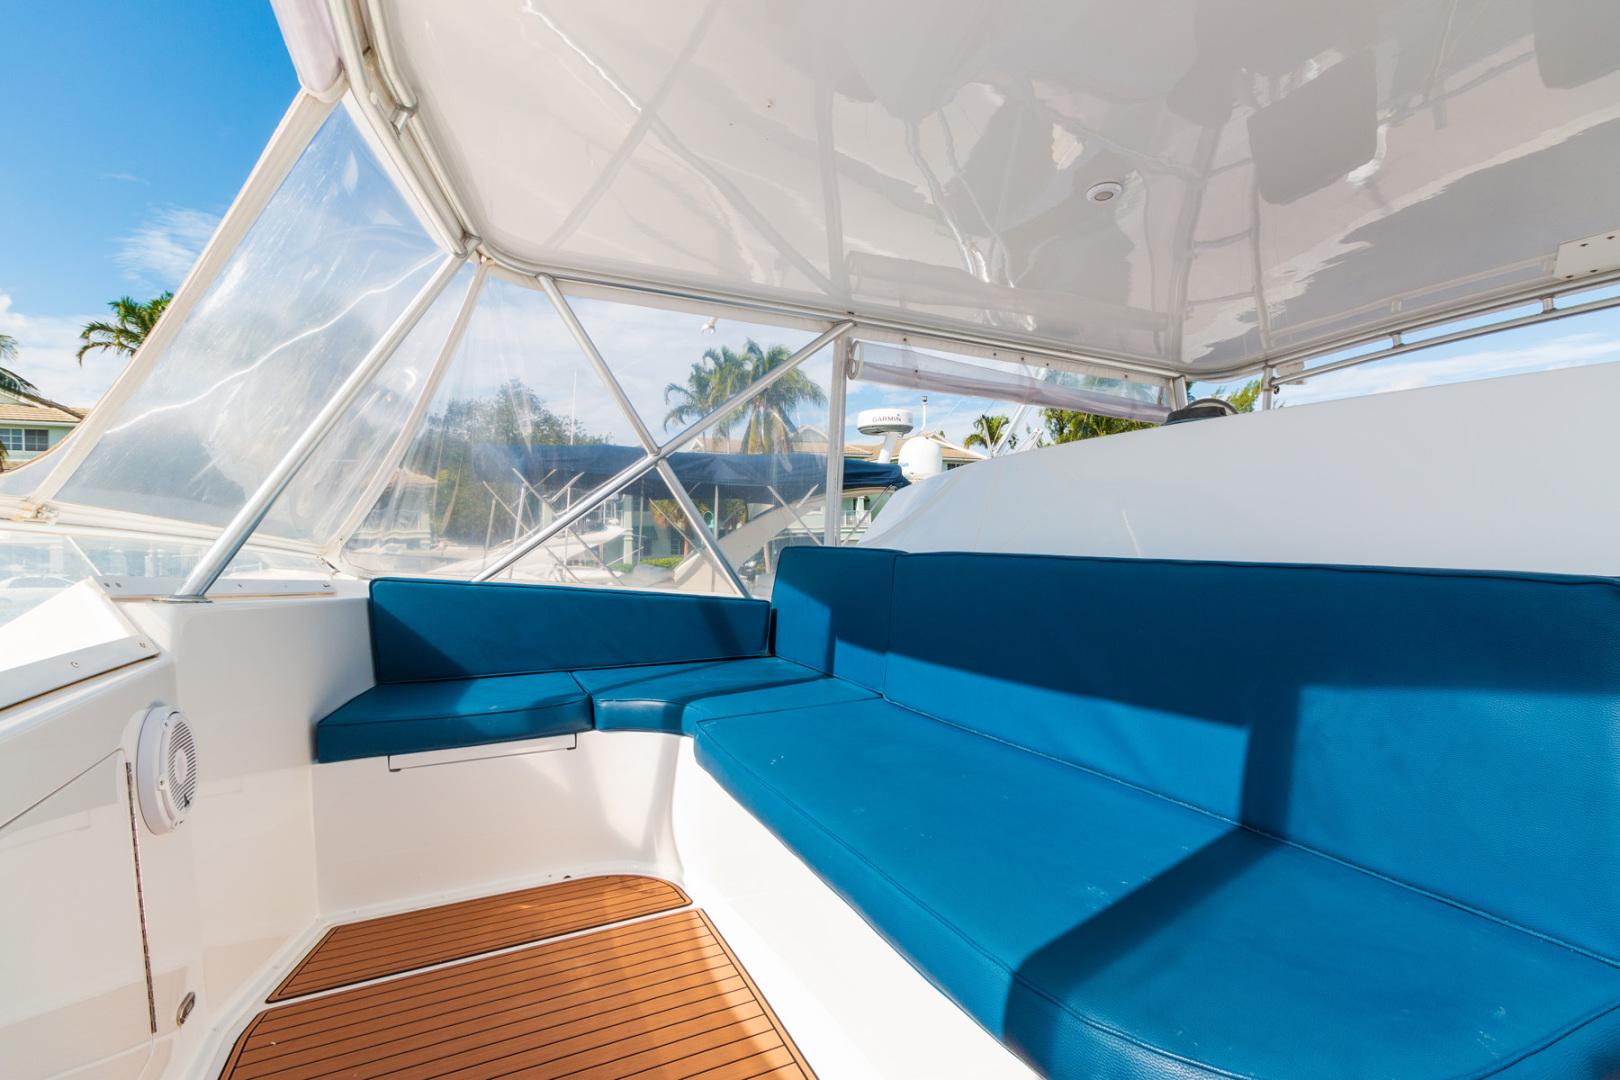 Viking-Convertible 2000-Knotty Girl Fort Lauderdale-Florida-United States-1564782   Thumbnail